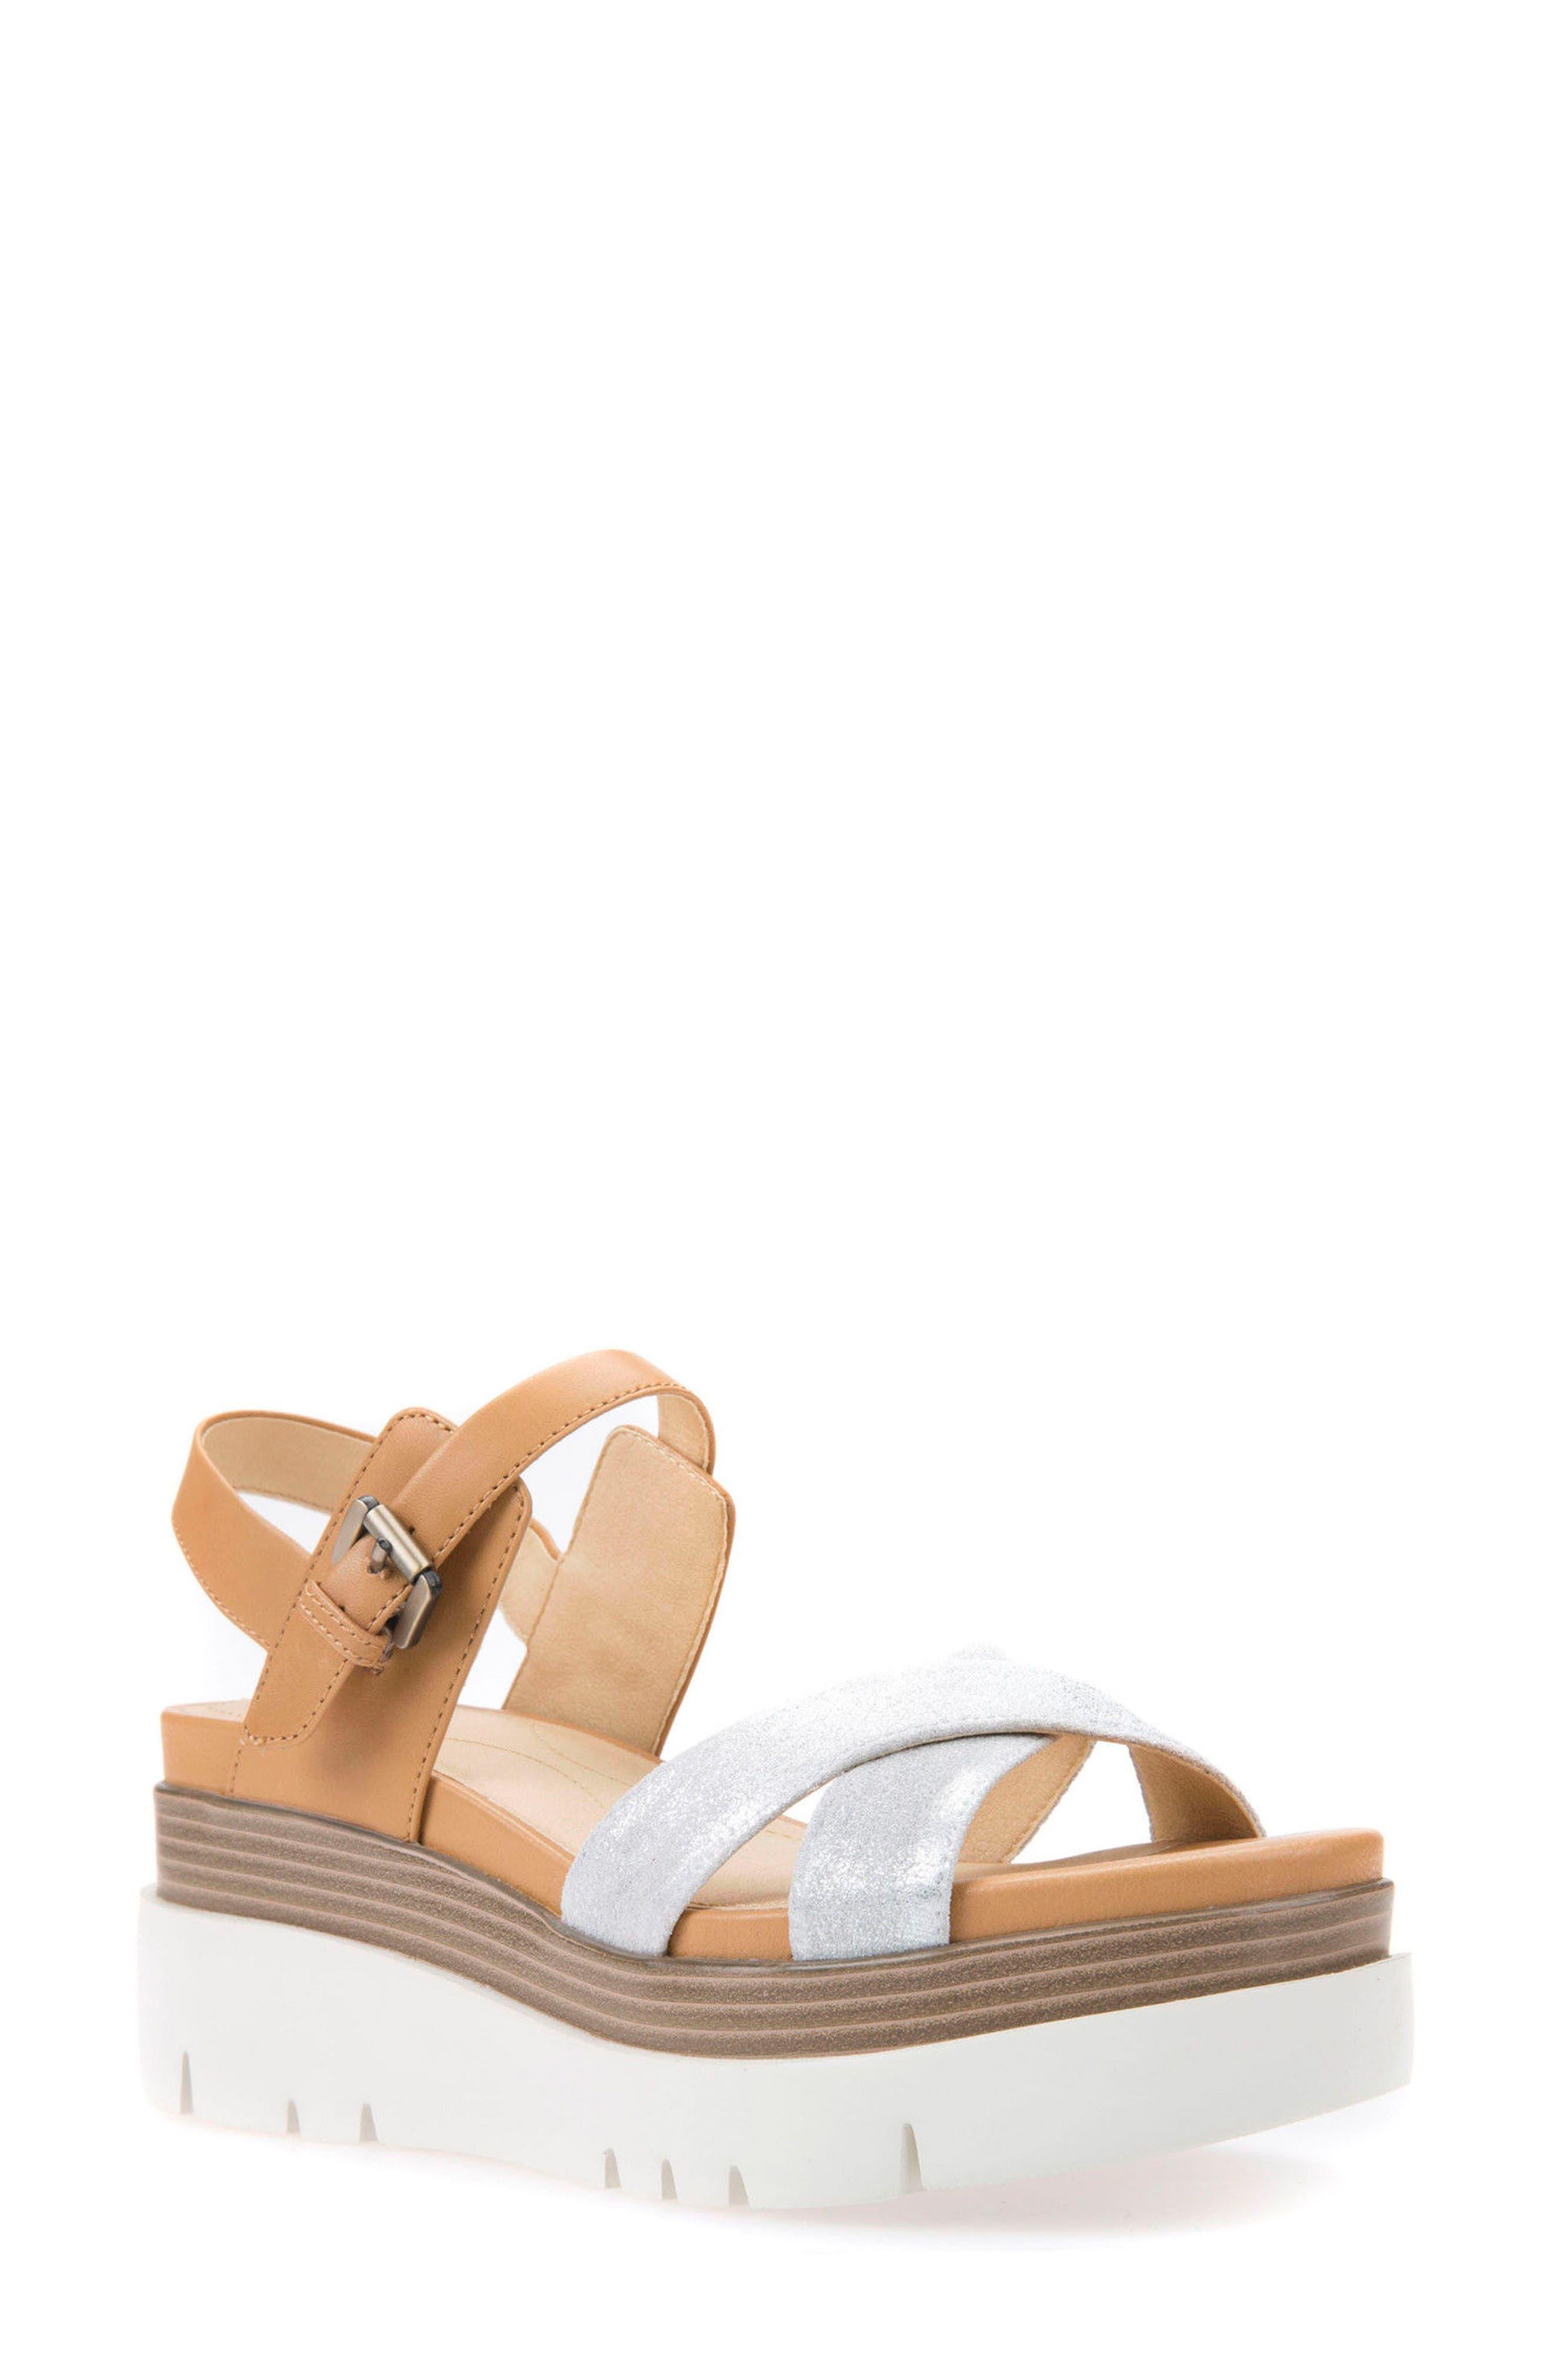 Alternate Image 1 Selected - Geox Radwa Platform Sandal (Women)